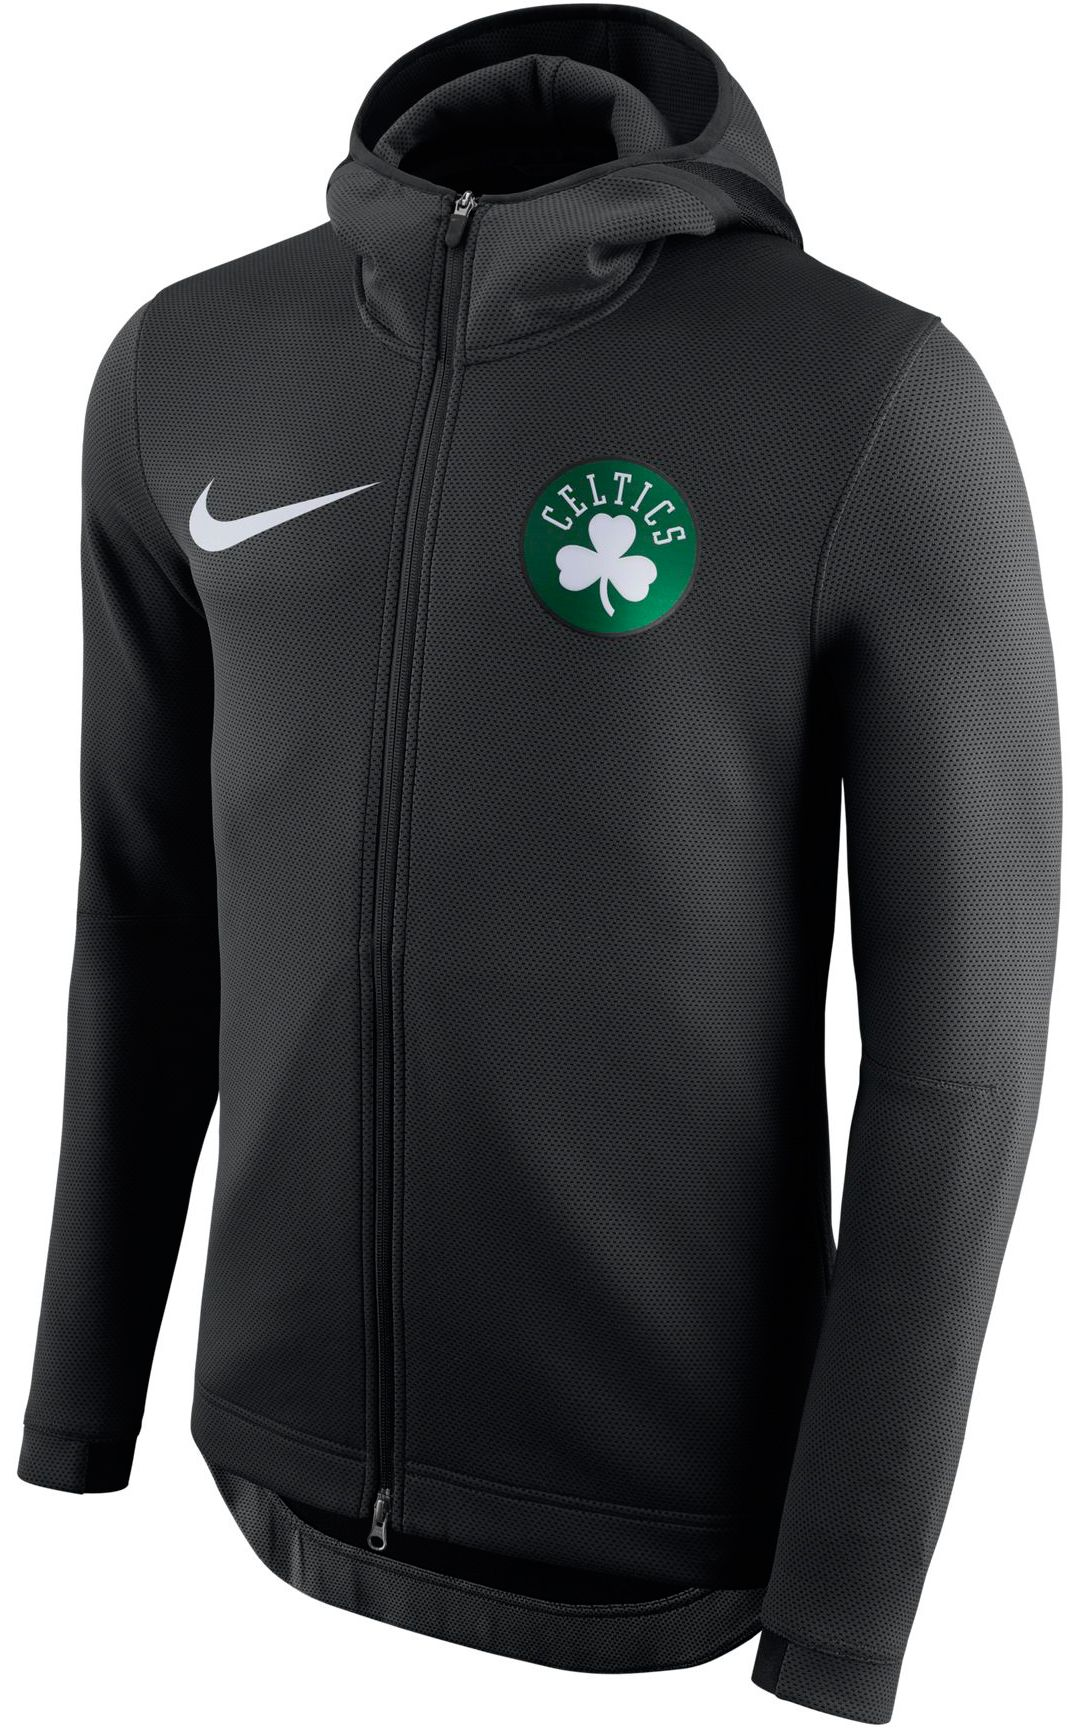 factory price 247d1 1c447 Nike Men's Boston Celtics On-Court Therma Flex Showtime Full-Zip Hoodie